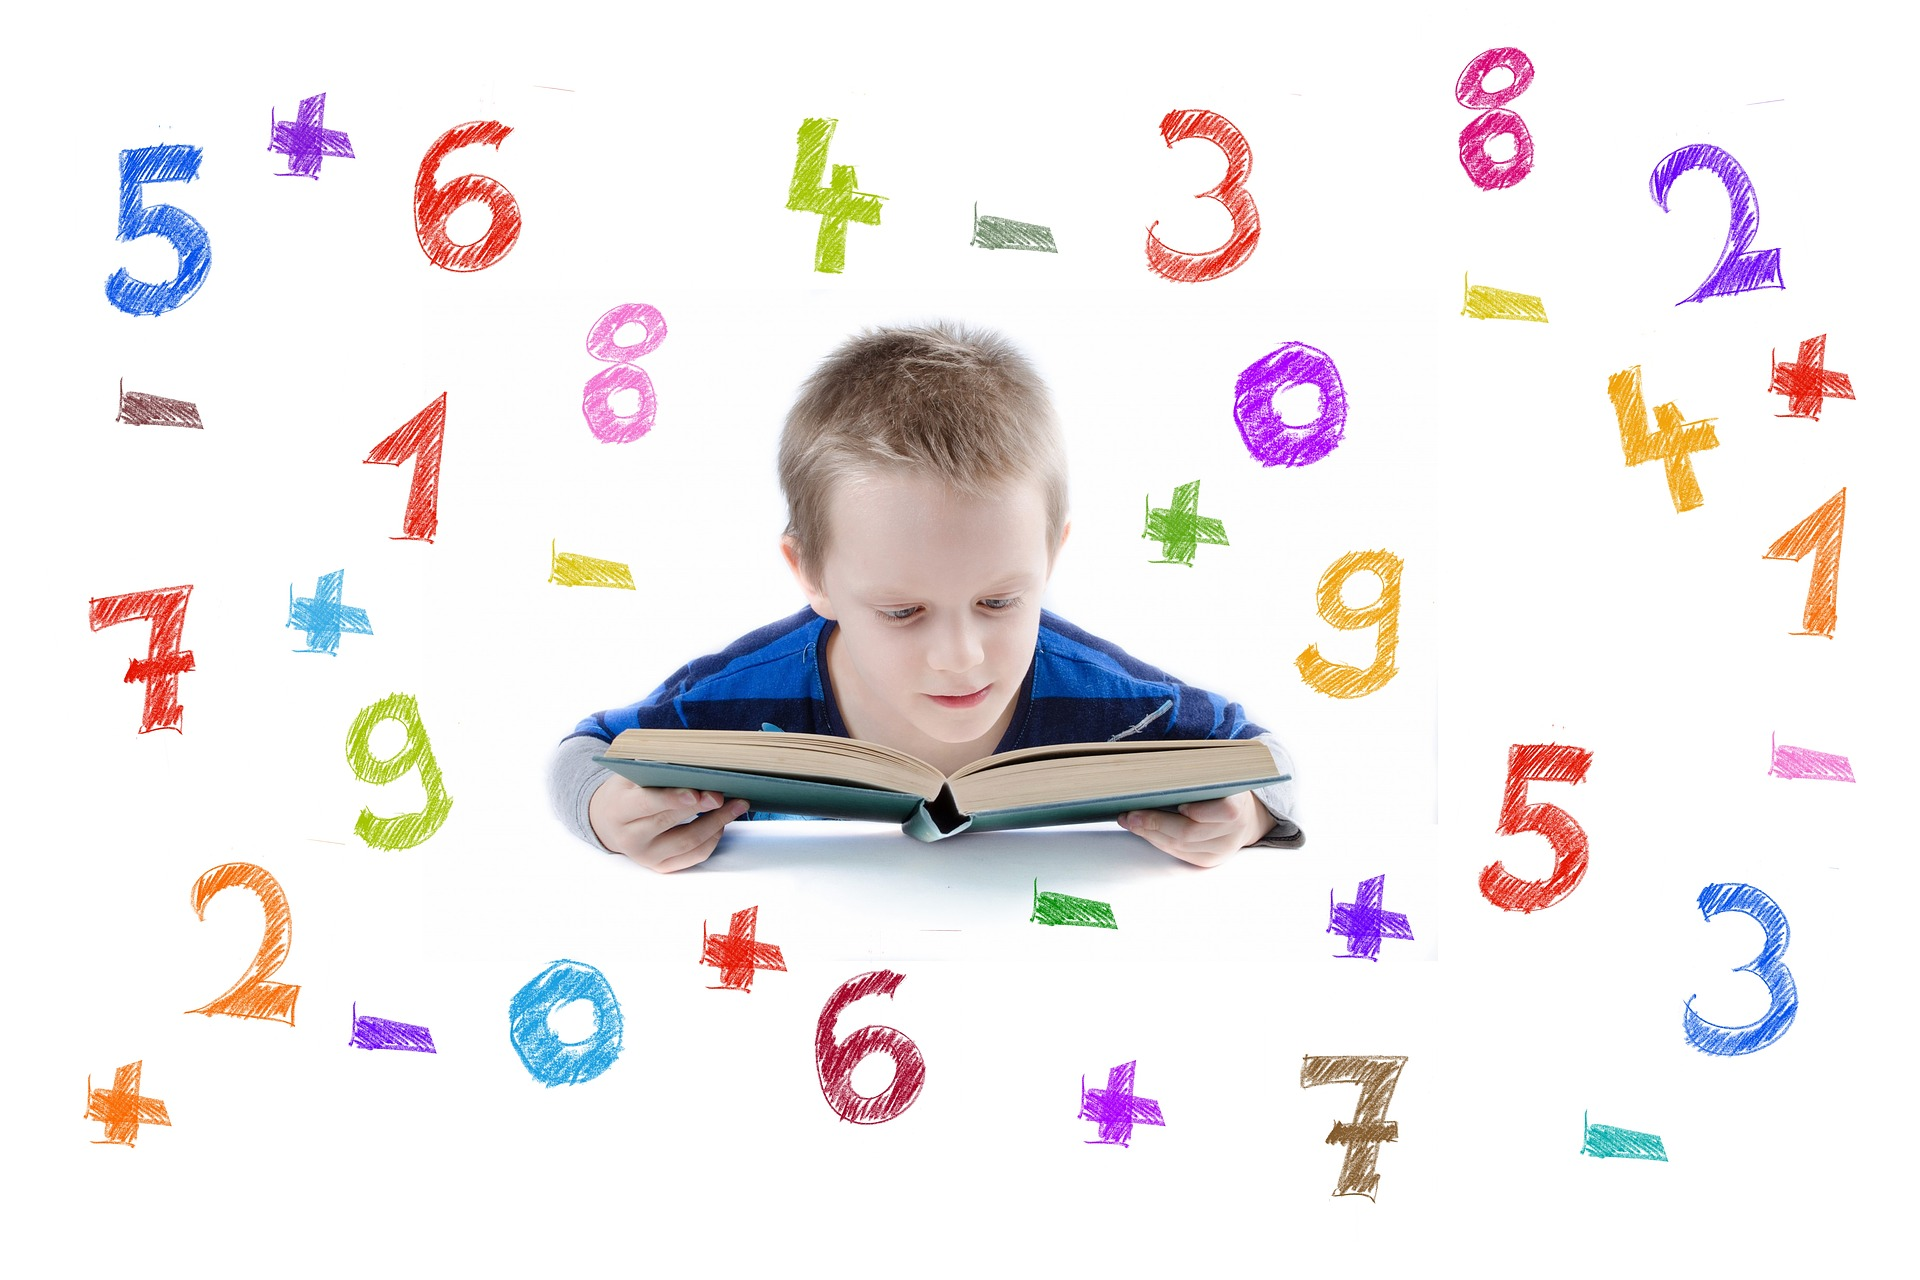 https://nofusstutors.com/blog-posts/multiplication-chart